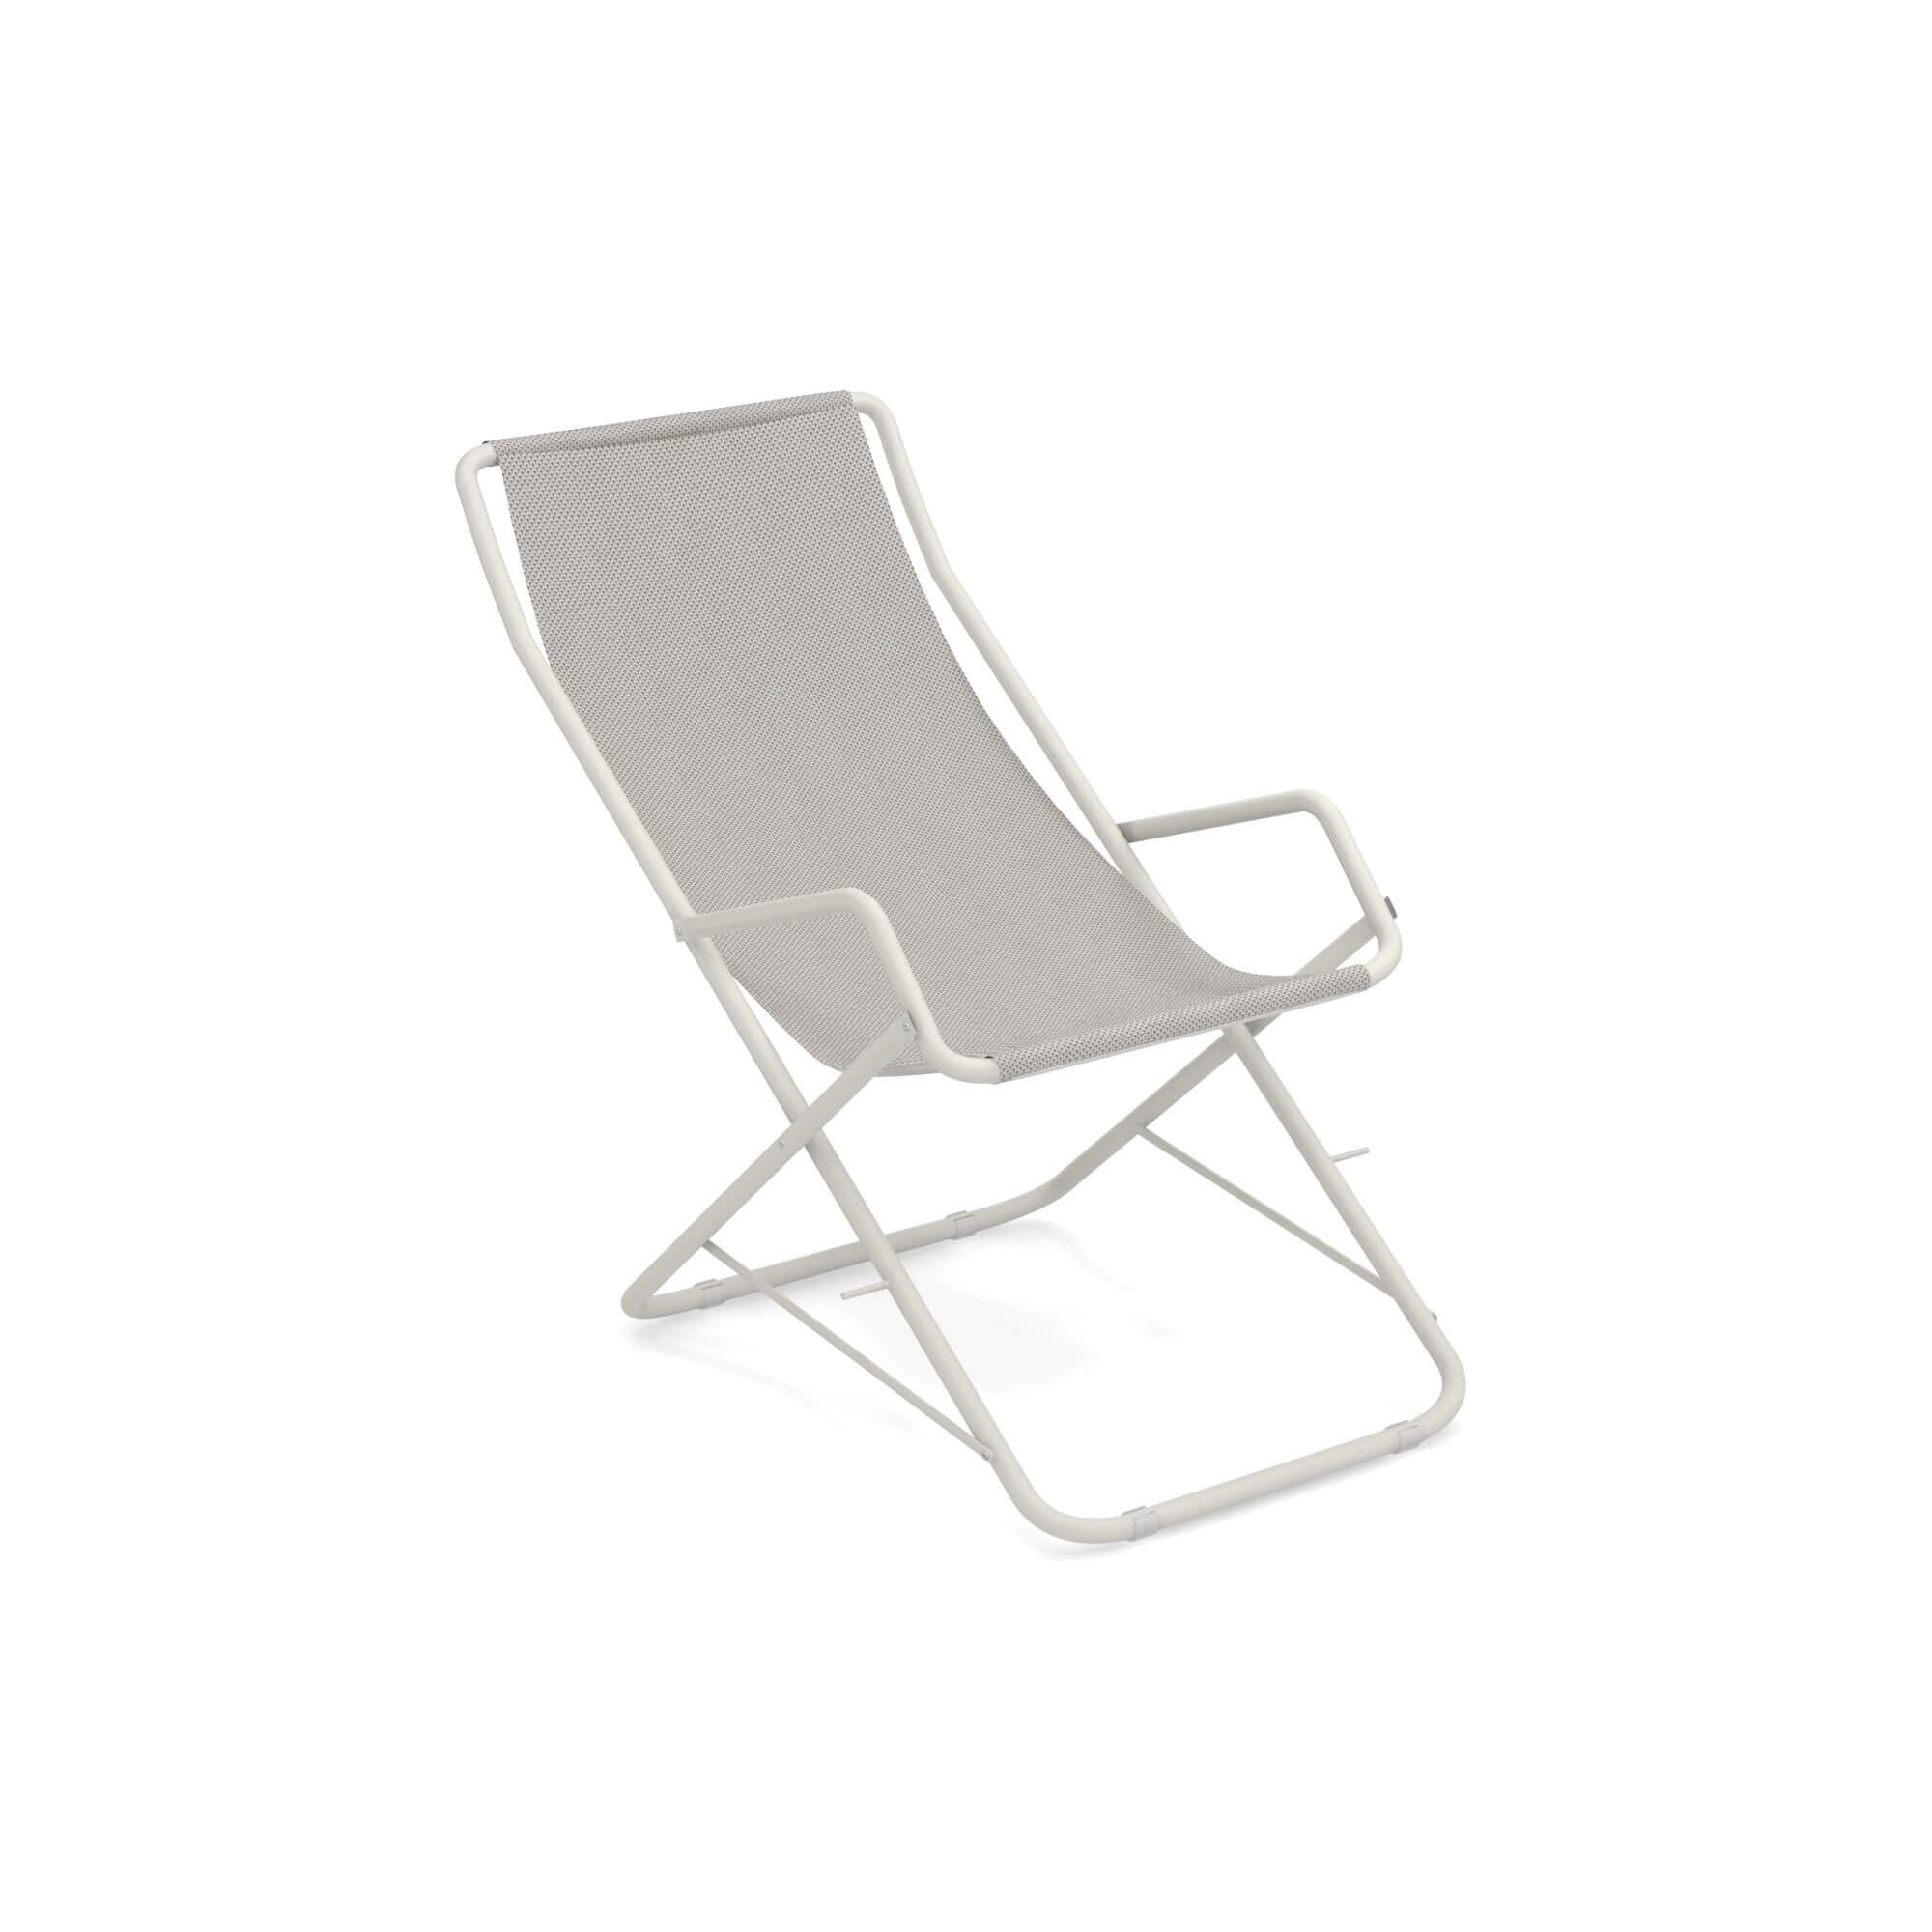 emu liegestuhl bahama wei grau online kaufen exclusive. Black Bedroom Furniture Sets. Home Design Ideas